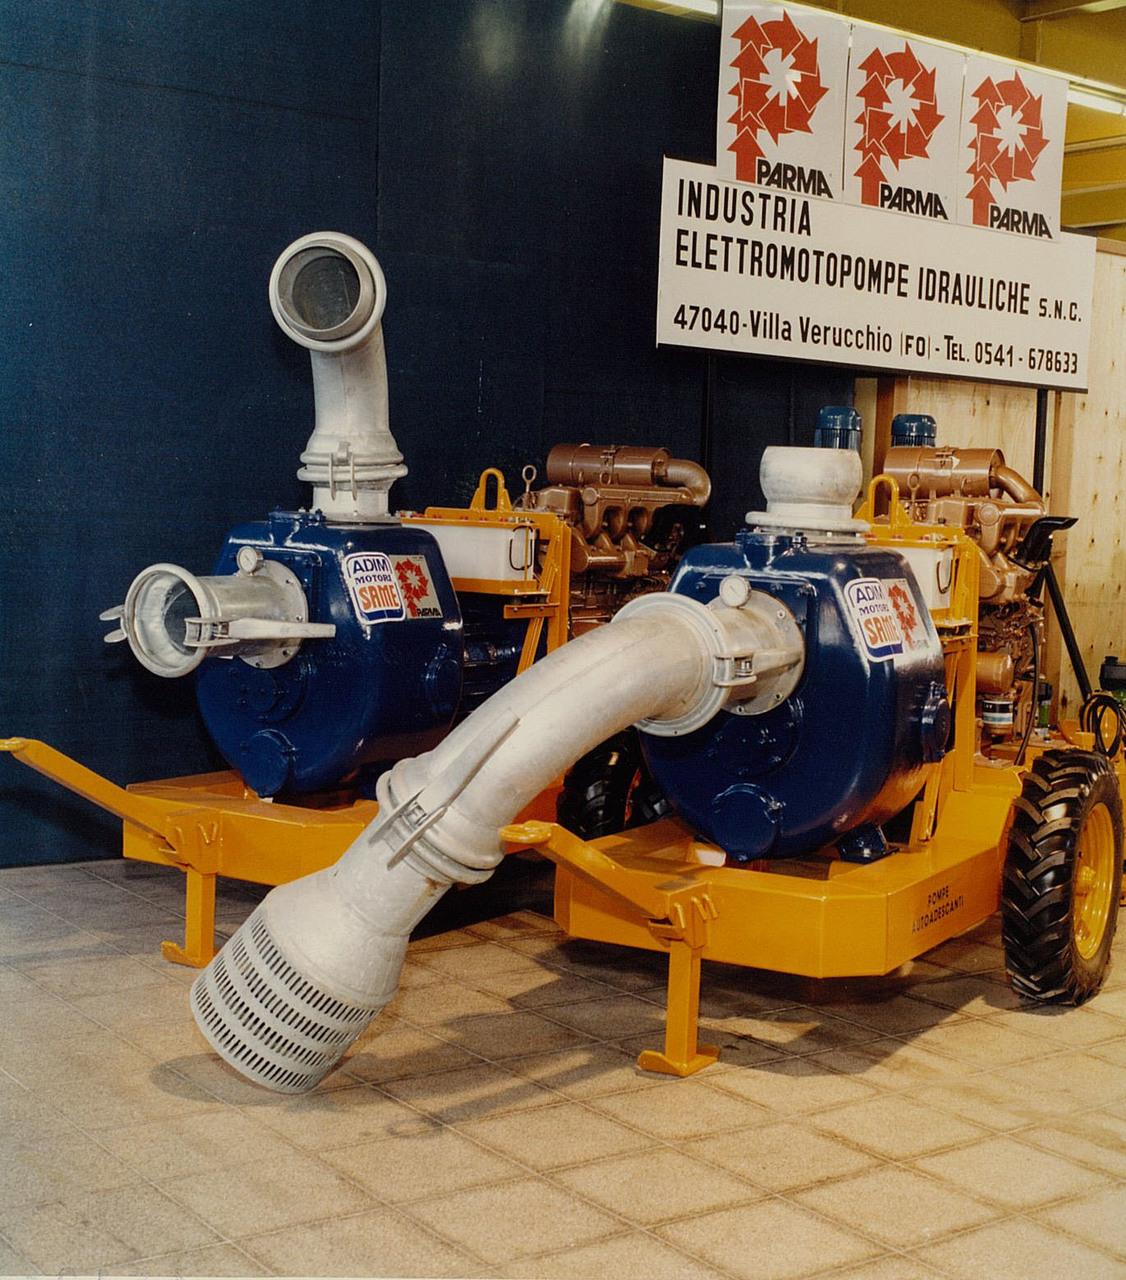 Motore ADIM per elettropompe